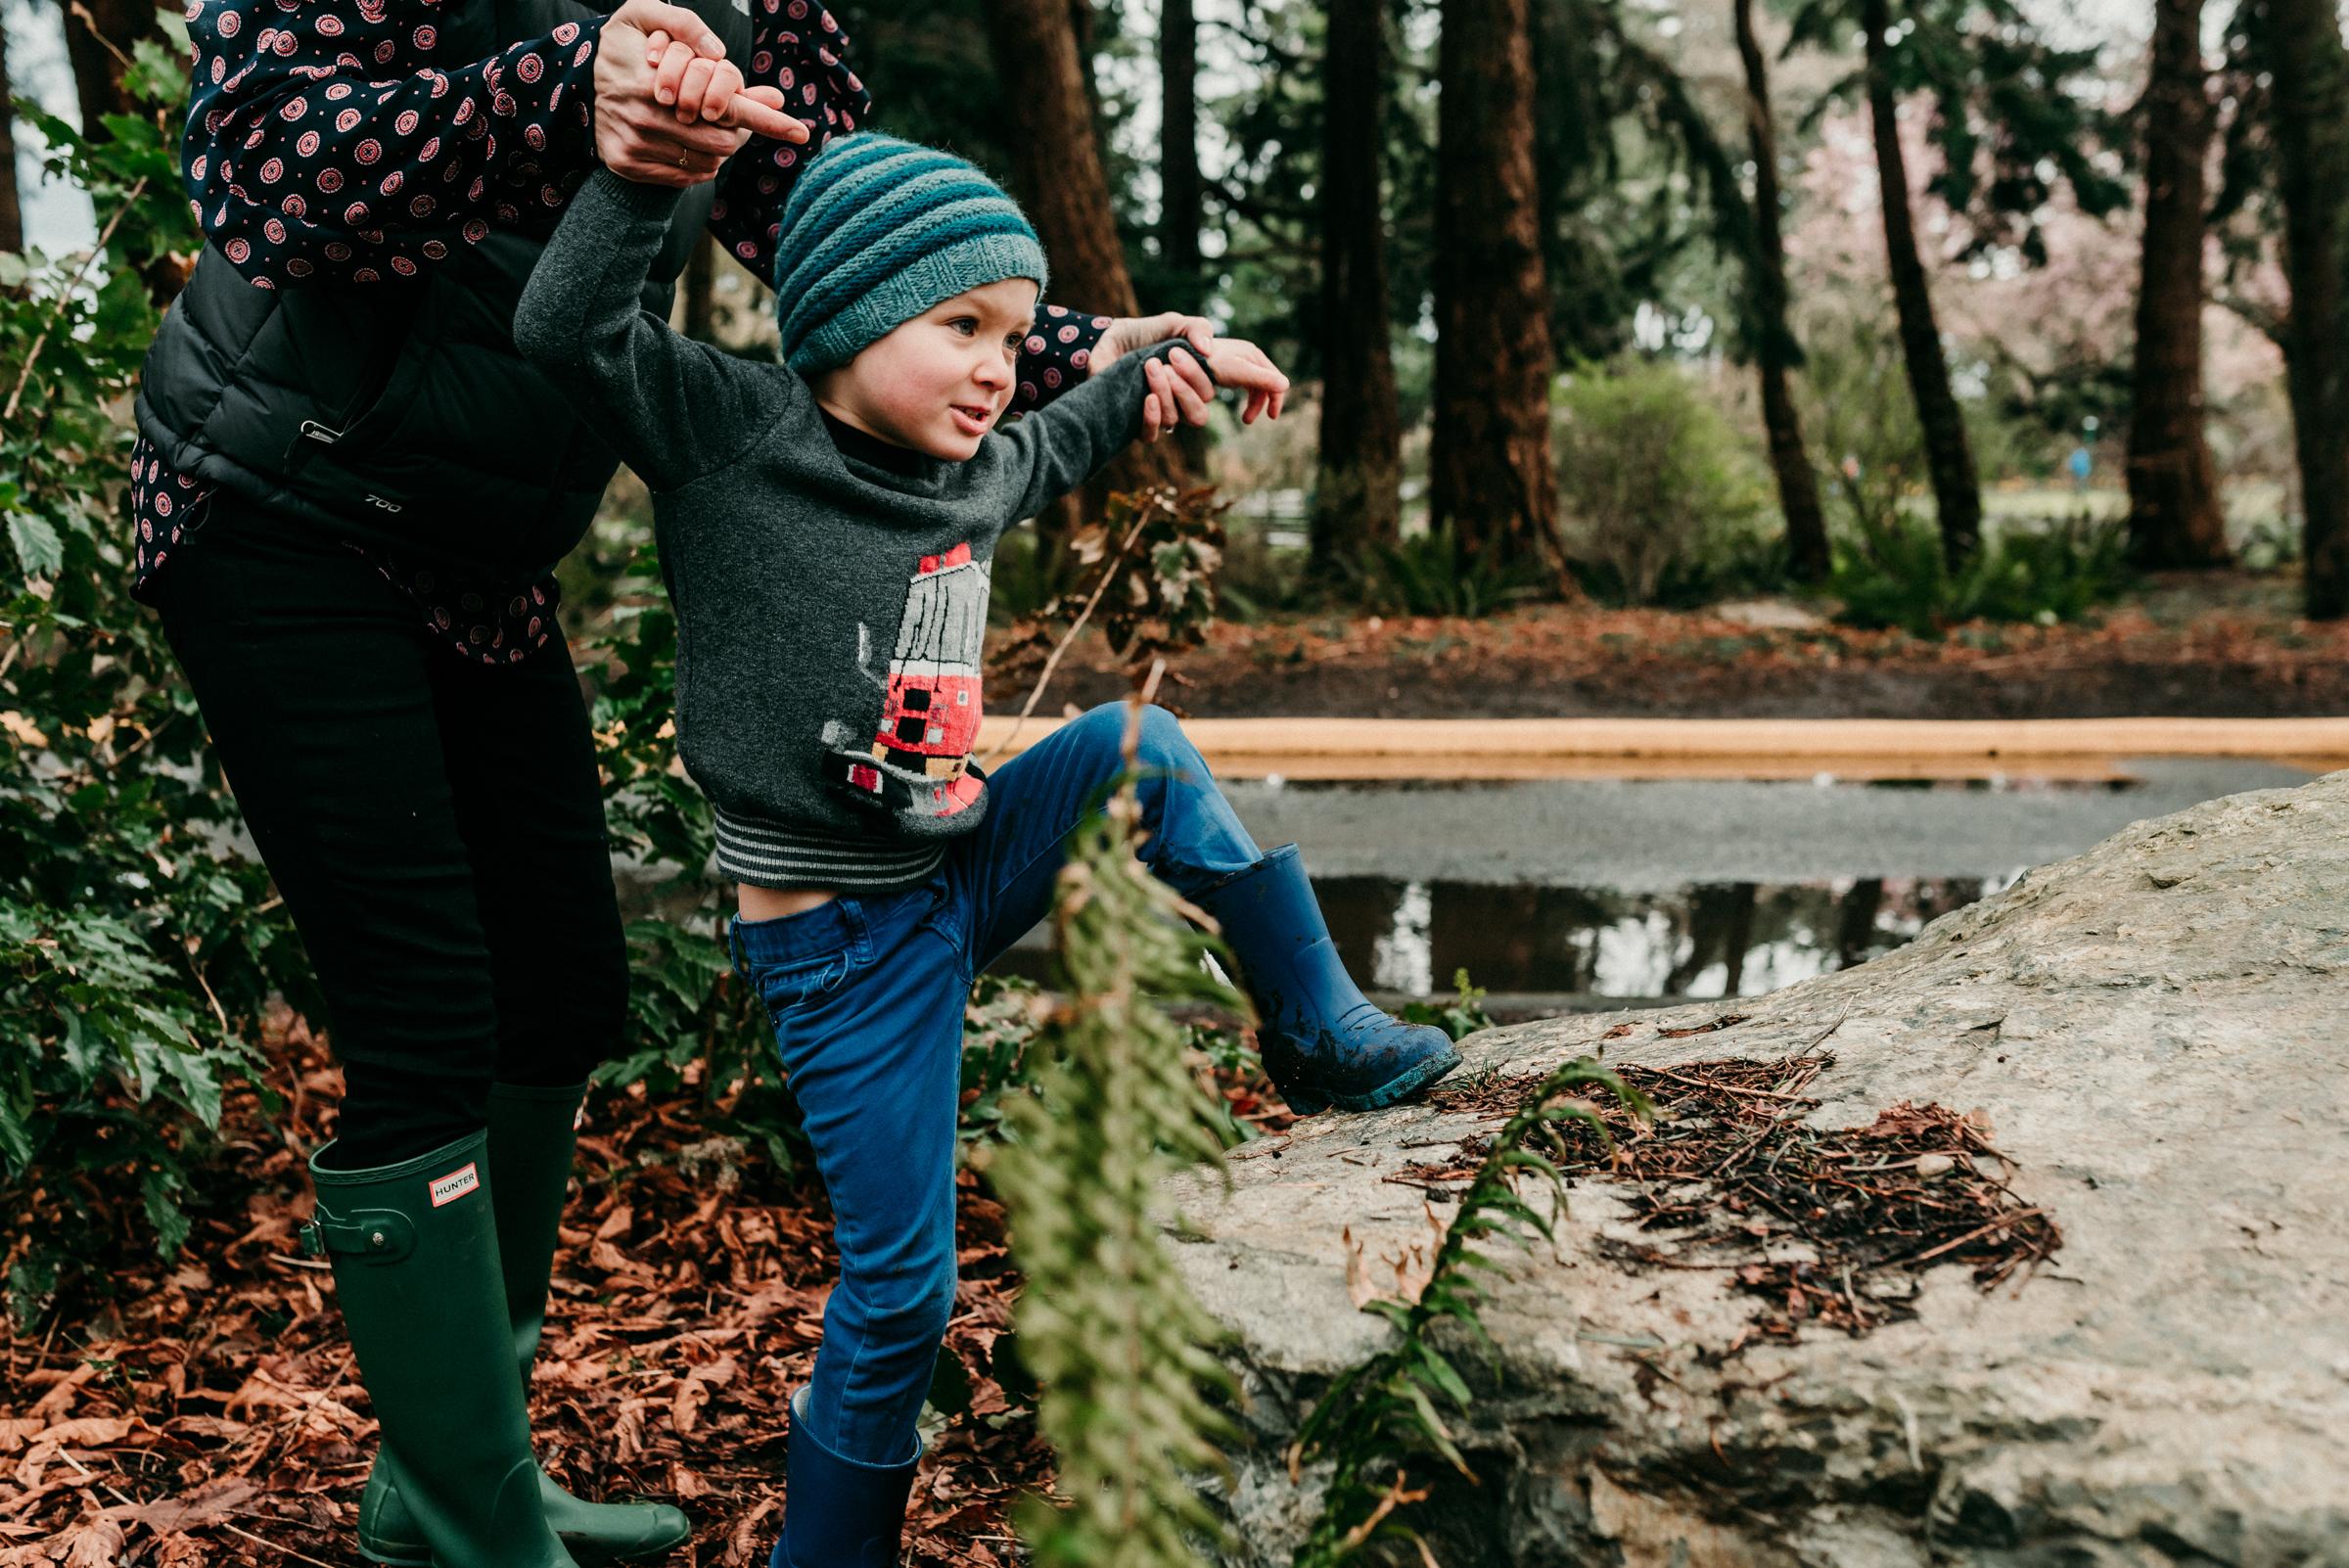 Nicola_Reiersen_Photography_Victoria_BC-48.jpg